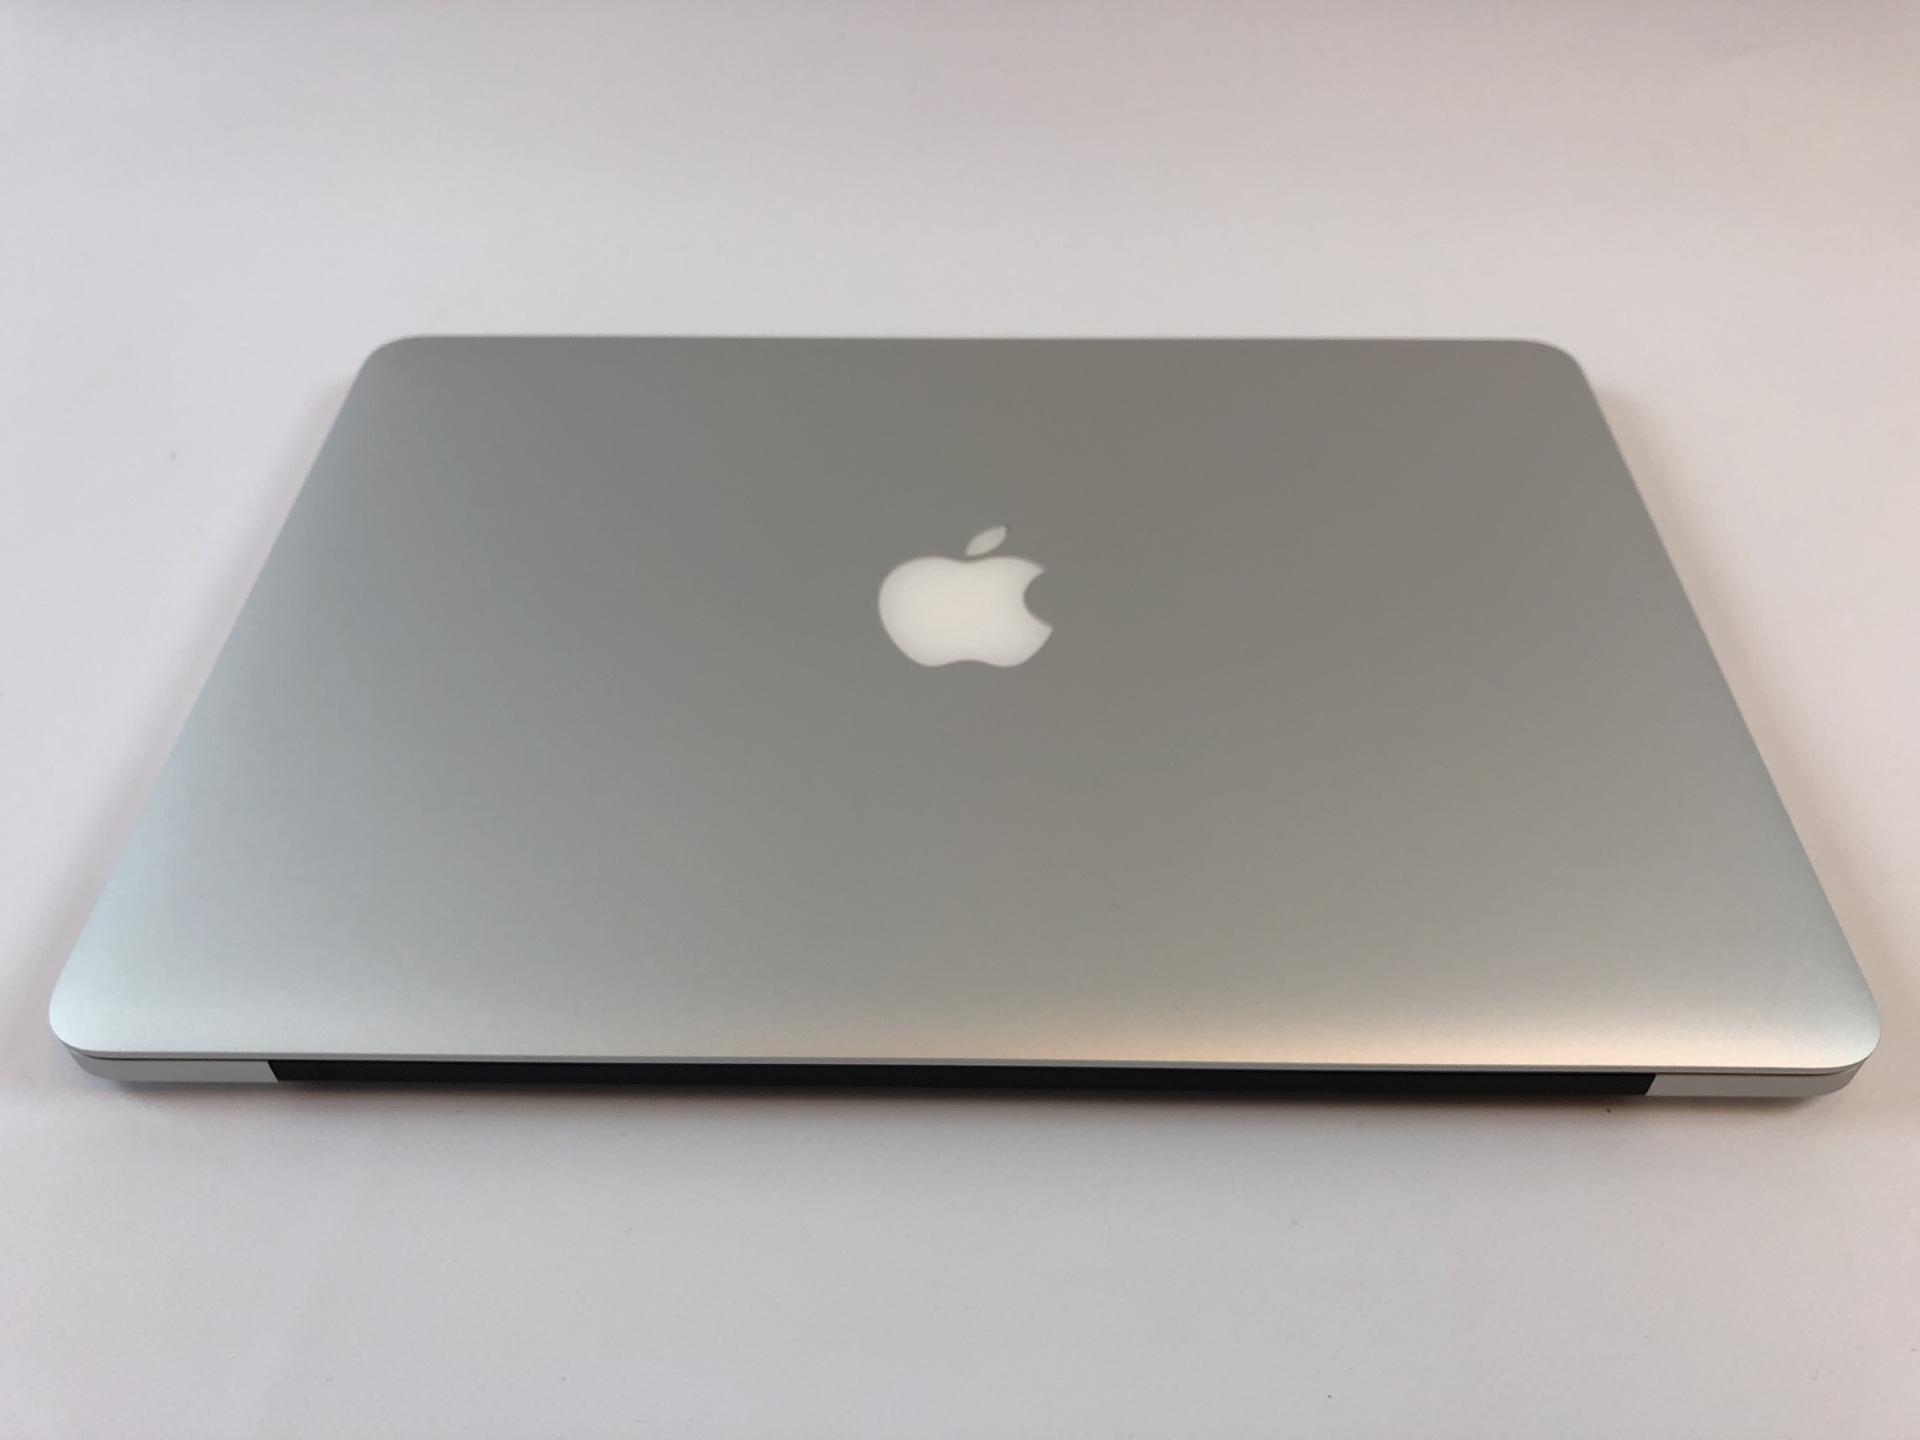 "MacBook Pro Retina 13"" Early 2015 (Intel Core i5 2.7 GHz 8 GB RAM 128 GB SSD), Intel Core i5 2.7 GHz, 8 GB RAM, 128 GB SSD, bild 2"